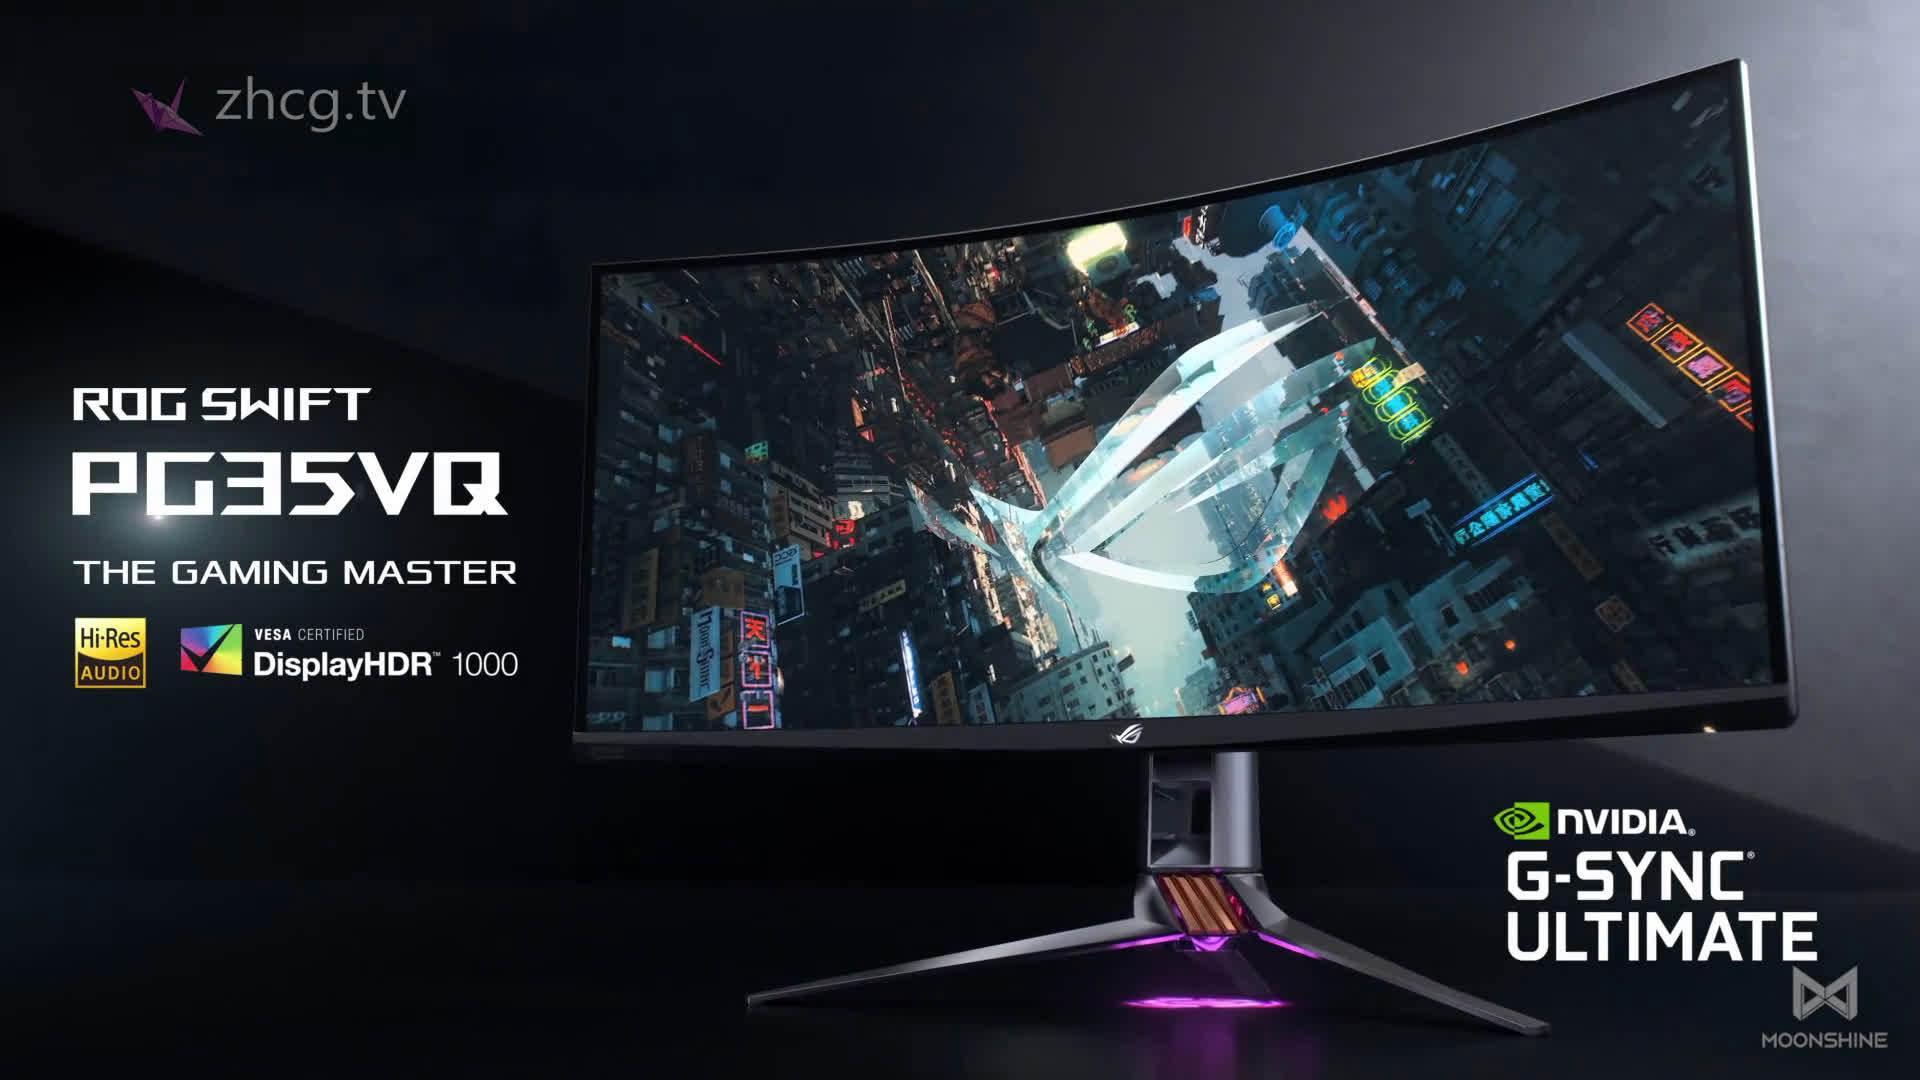 黑科技 华硕曲面显示器 宣传视频 ASUS ROG PG35 Gaming Monitor